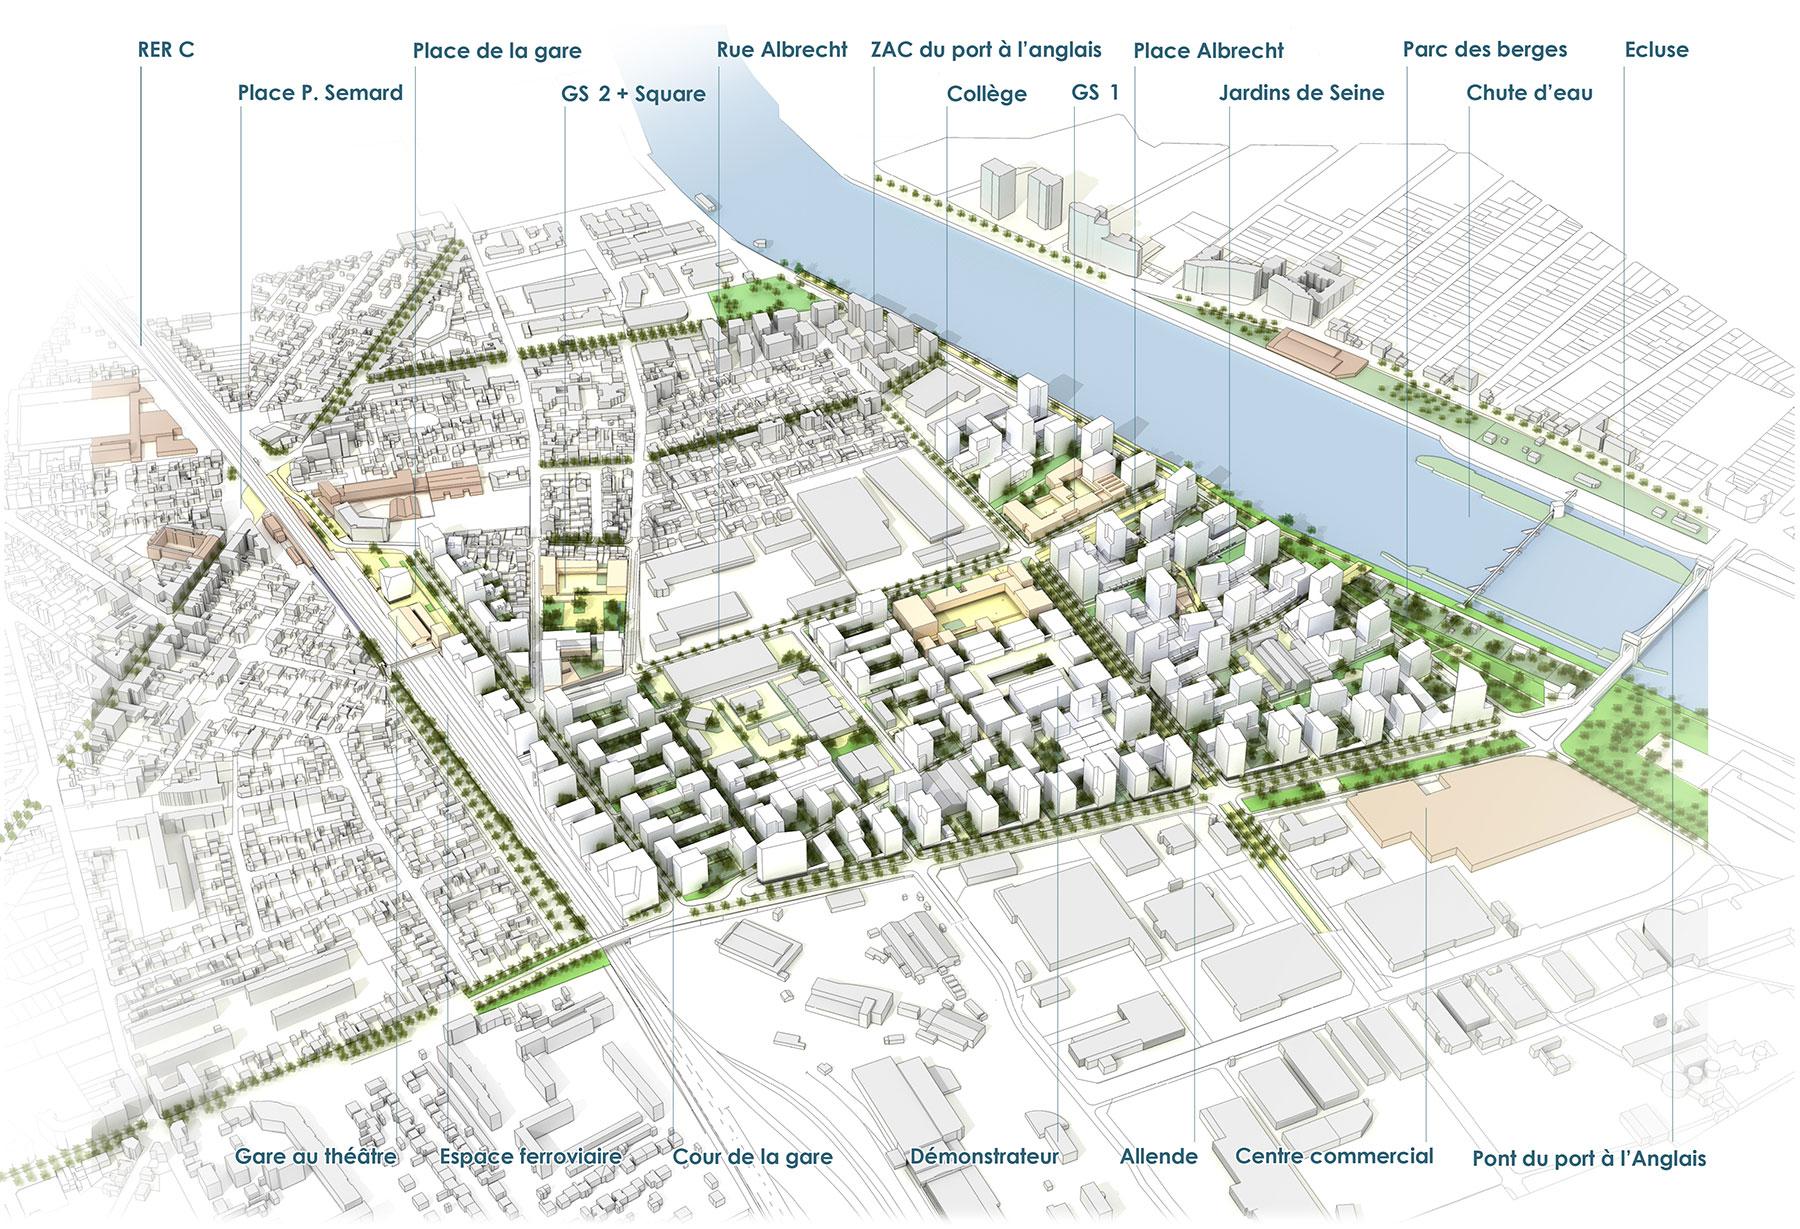 Vitry sur seine projet urbain seine gare germe jam for Projet architectural definition